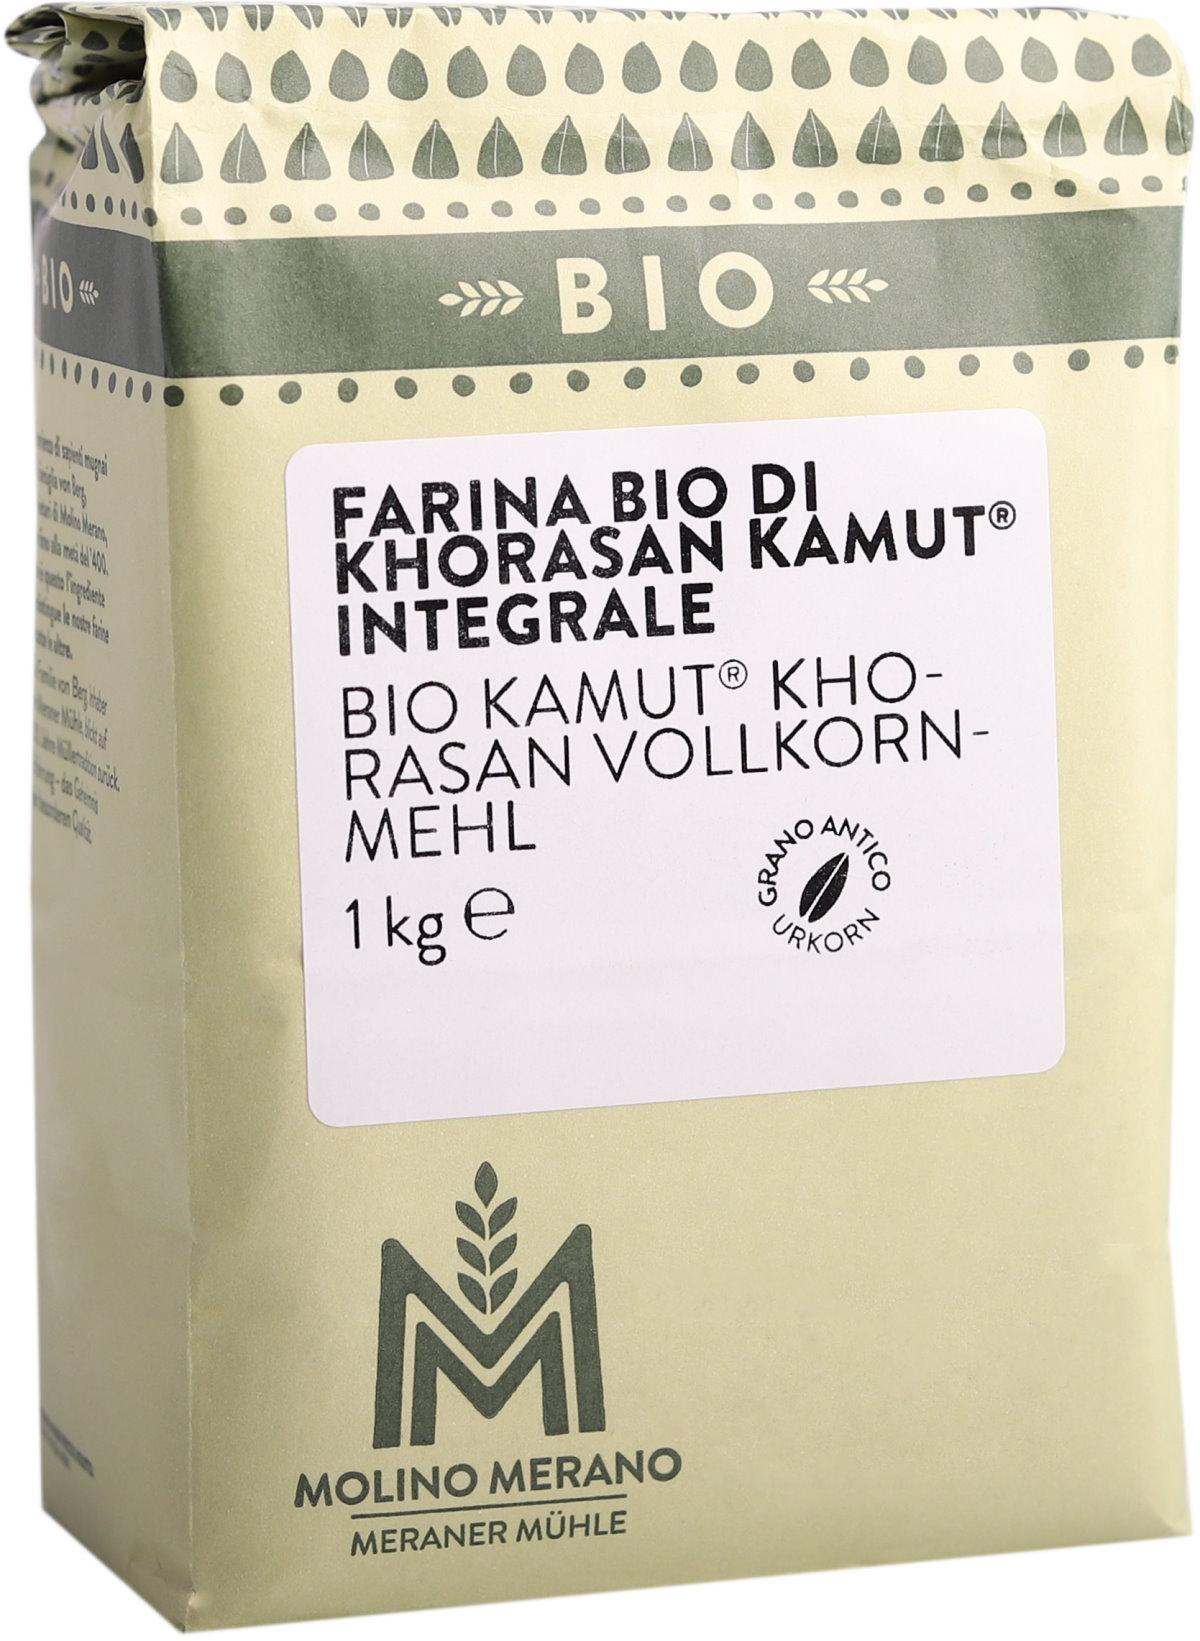 Organic Kamut® khorasan wholemeal flour